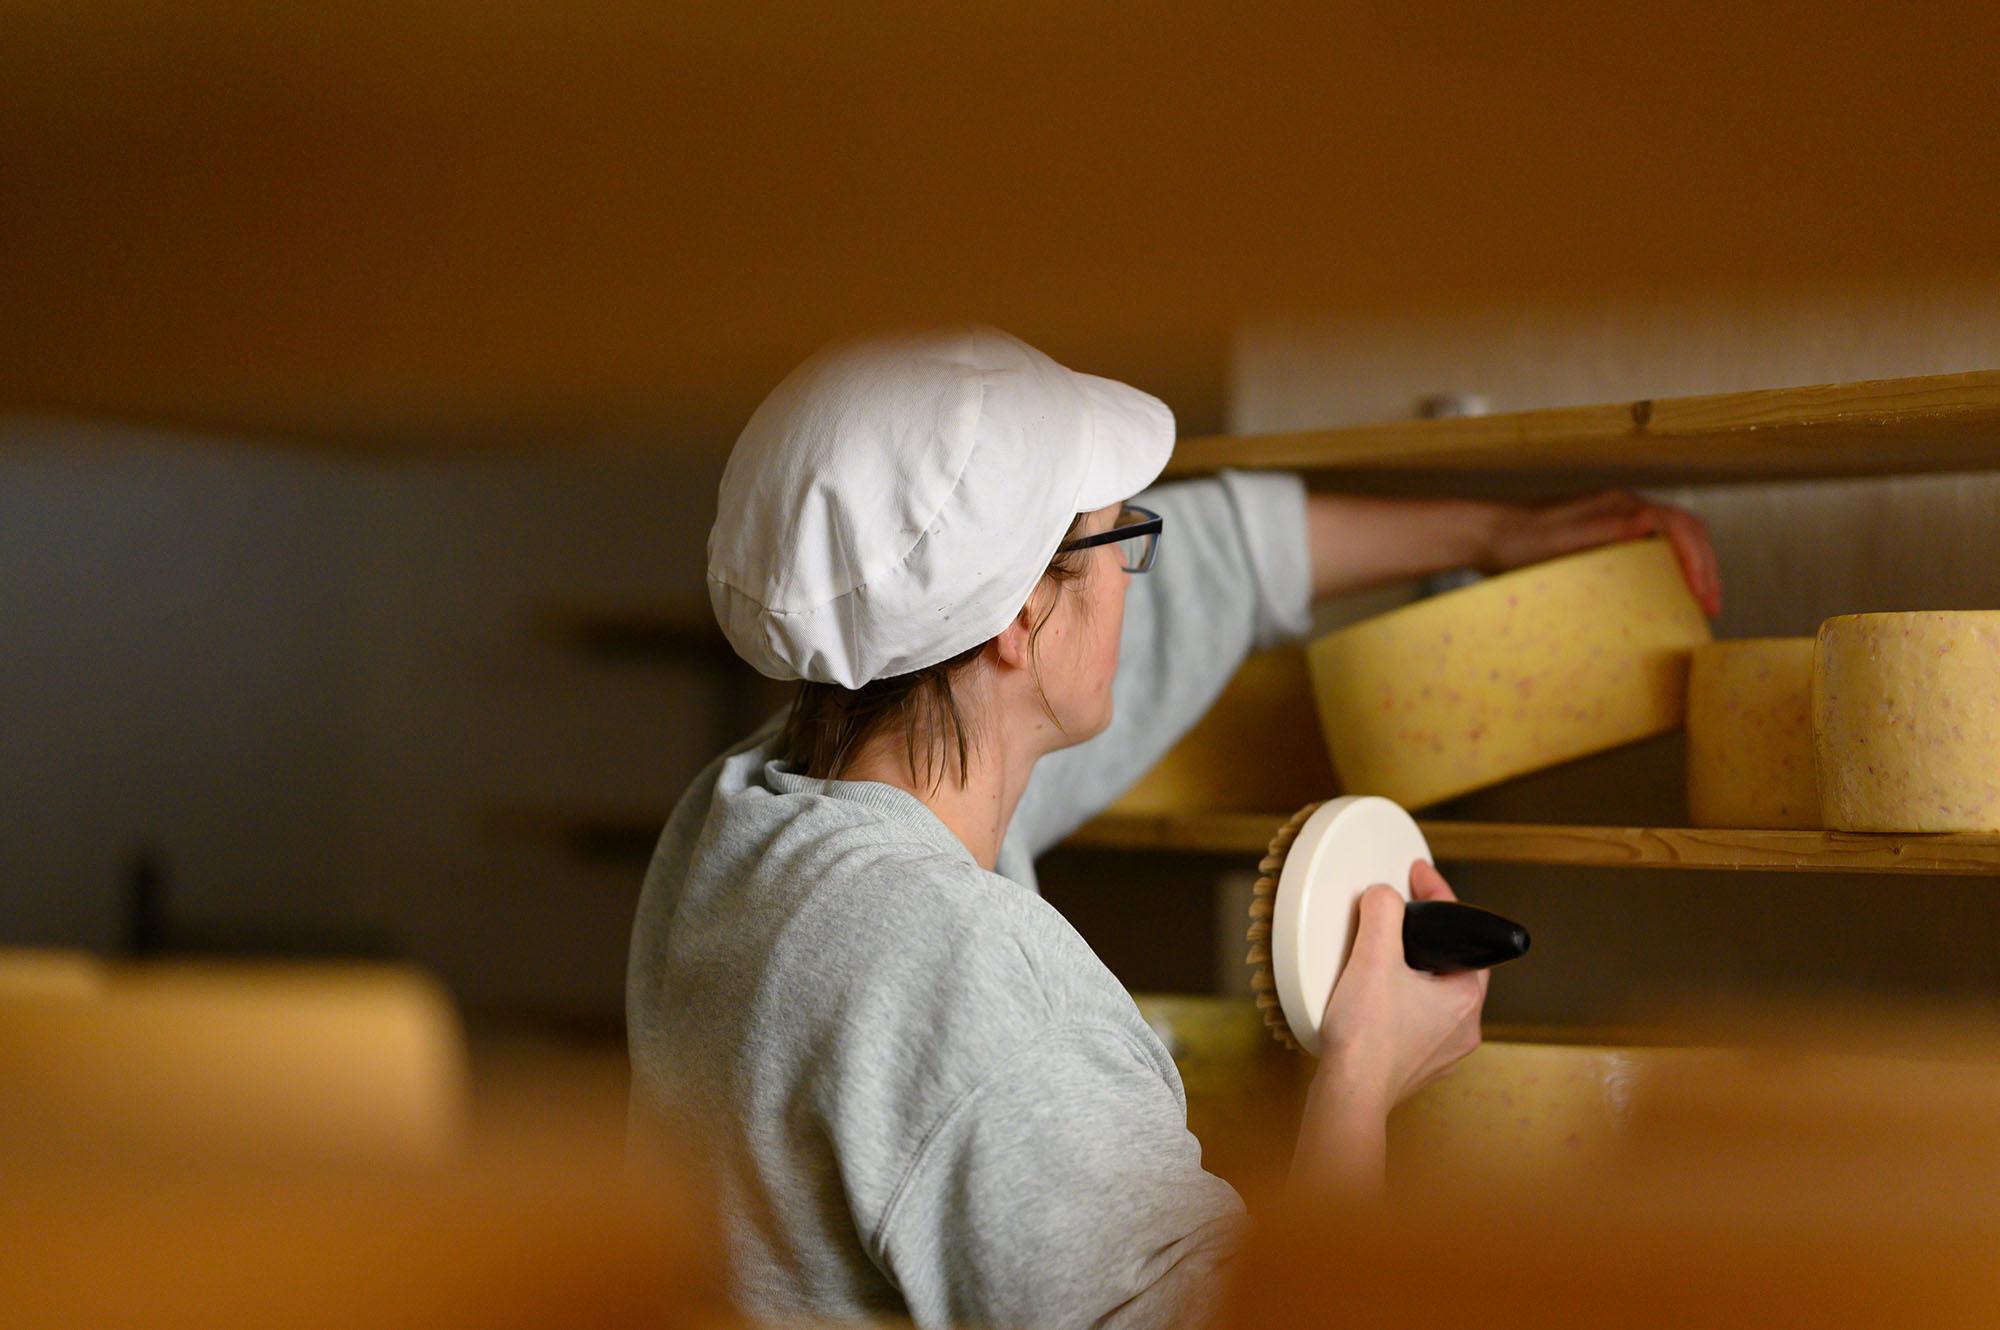 Käserin Karo bürstet im Käsekeller ihrer Käserei ihren Hartkäse